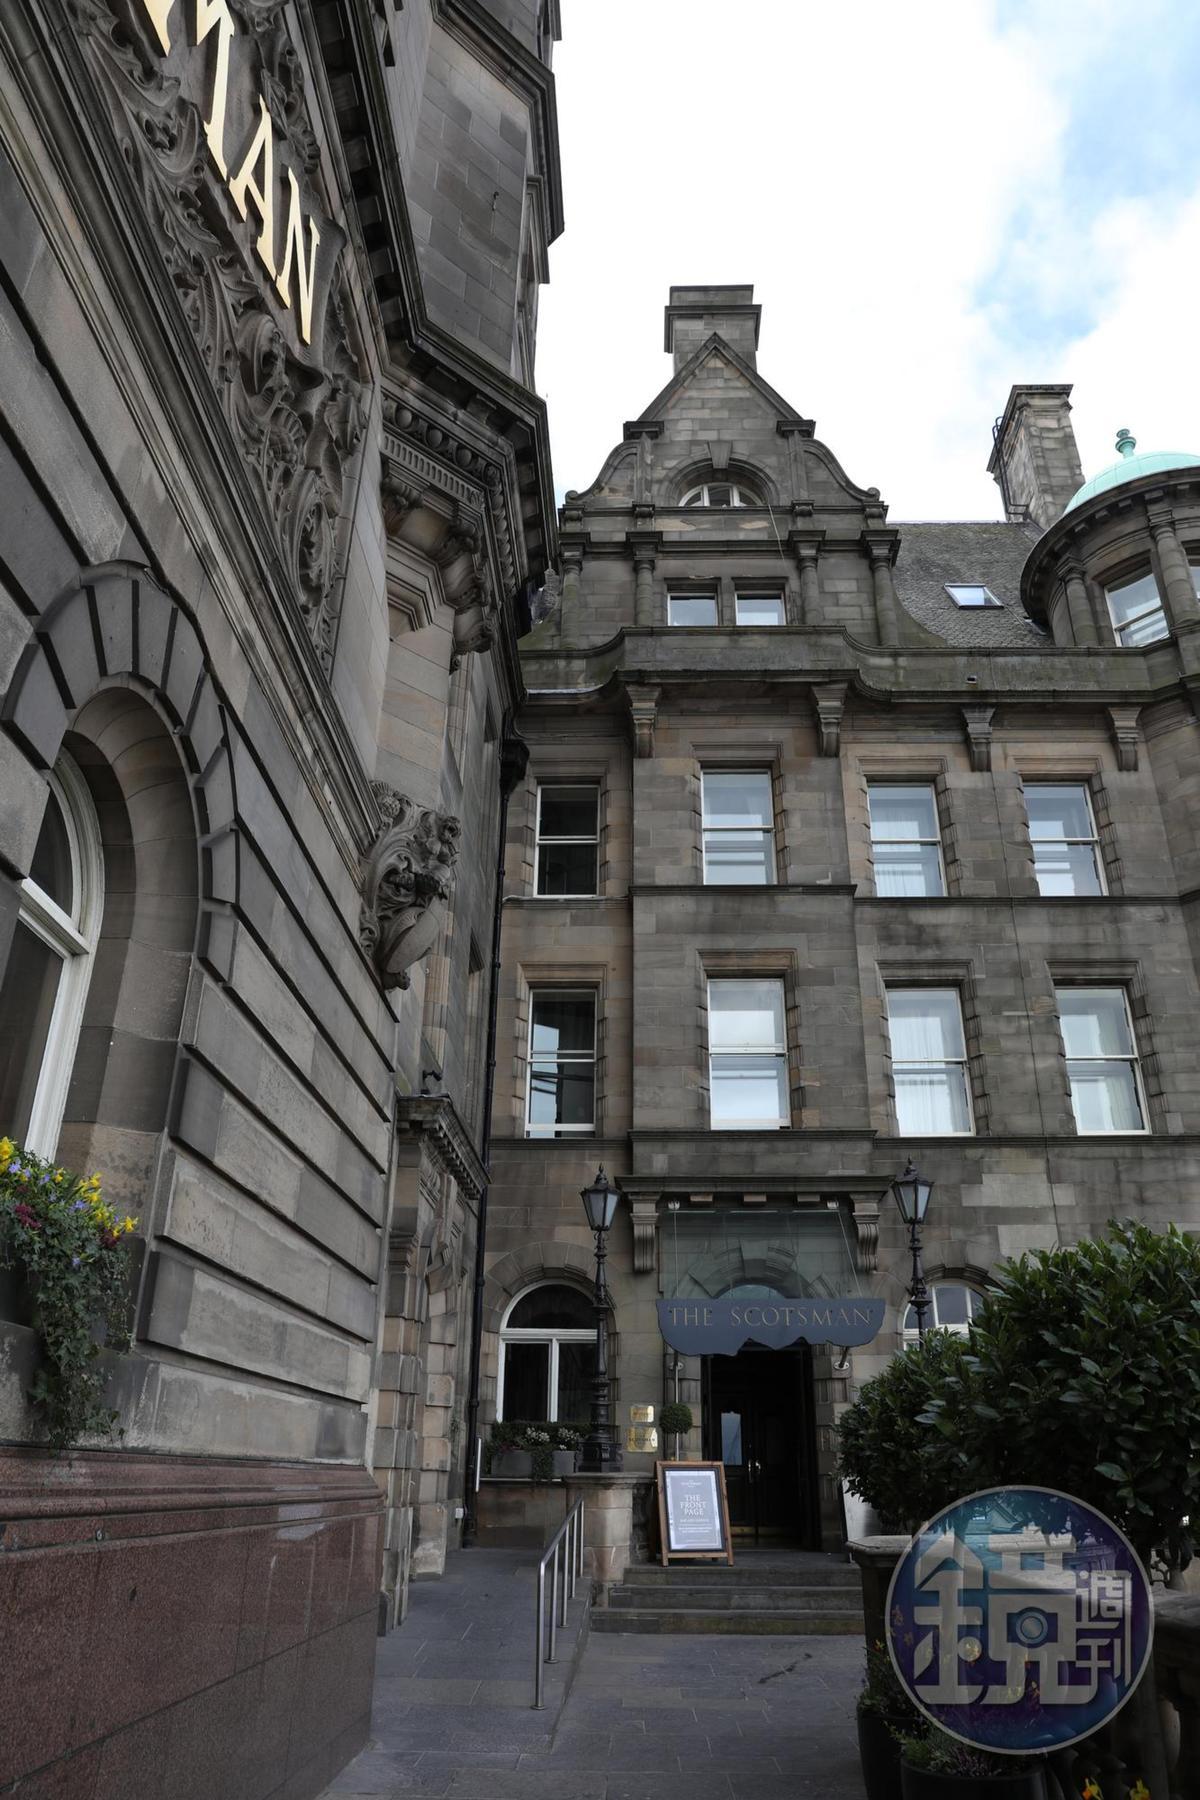 「The Scotsman Hotel」位在一棟非常古老的建築裡,英國王室也曾經造訪。